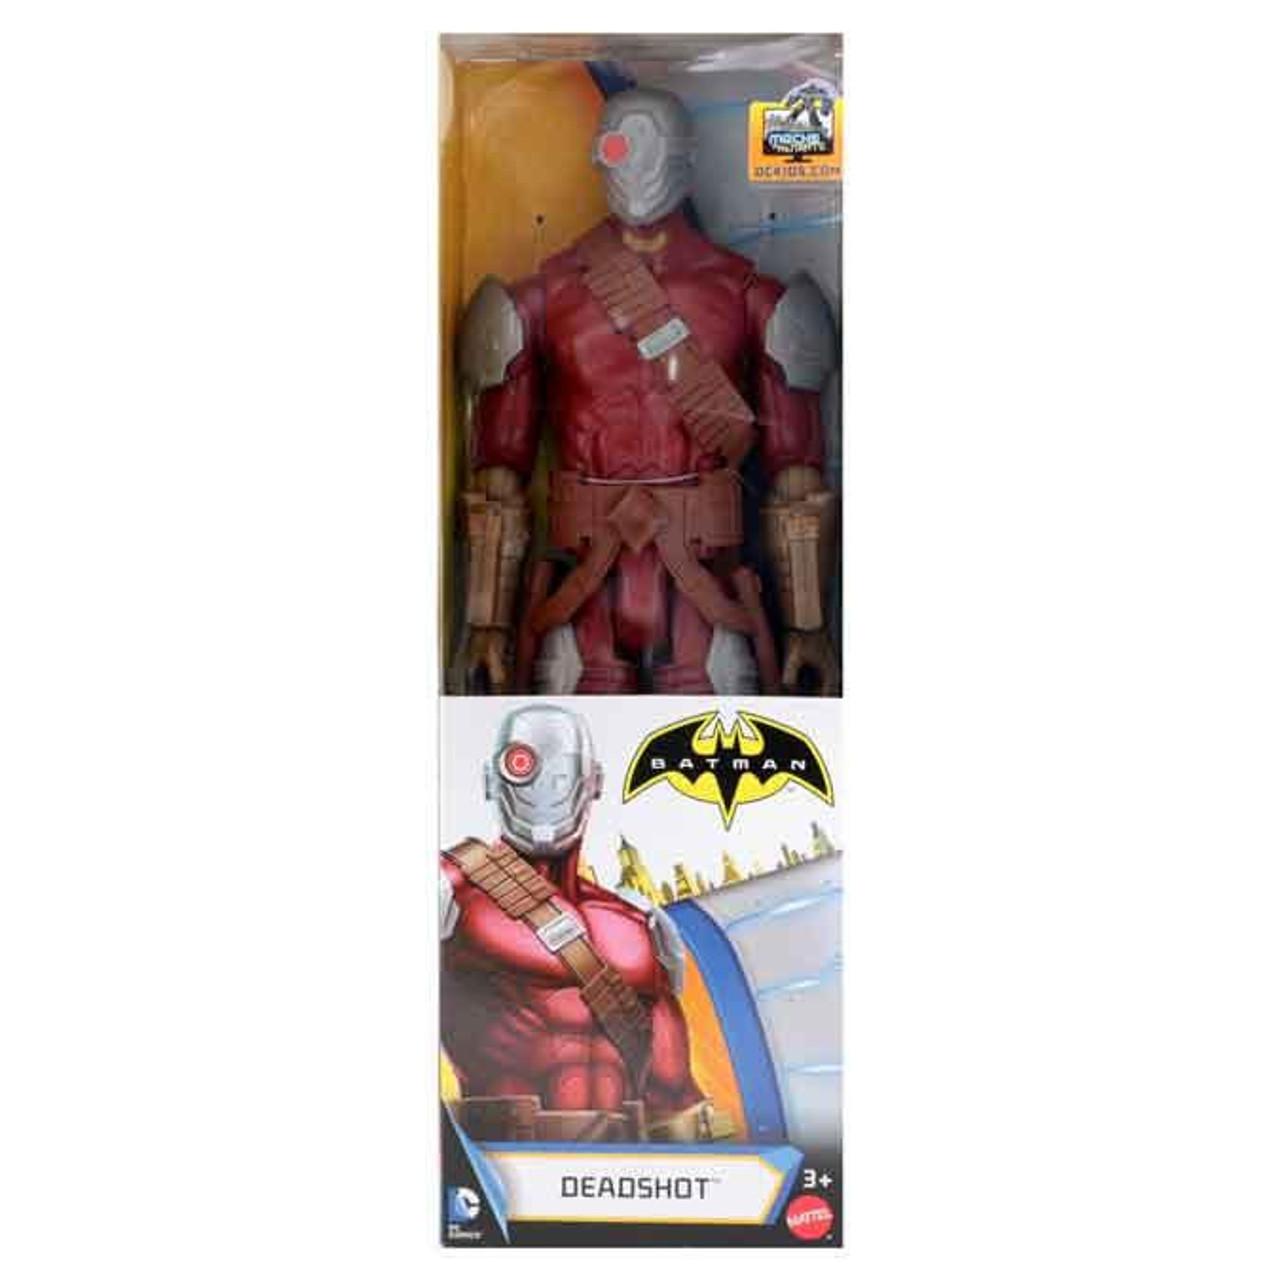 Batman - Deadshot Figure